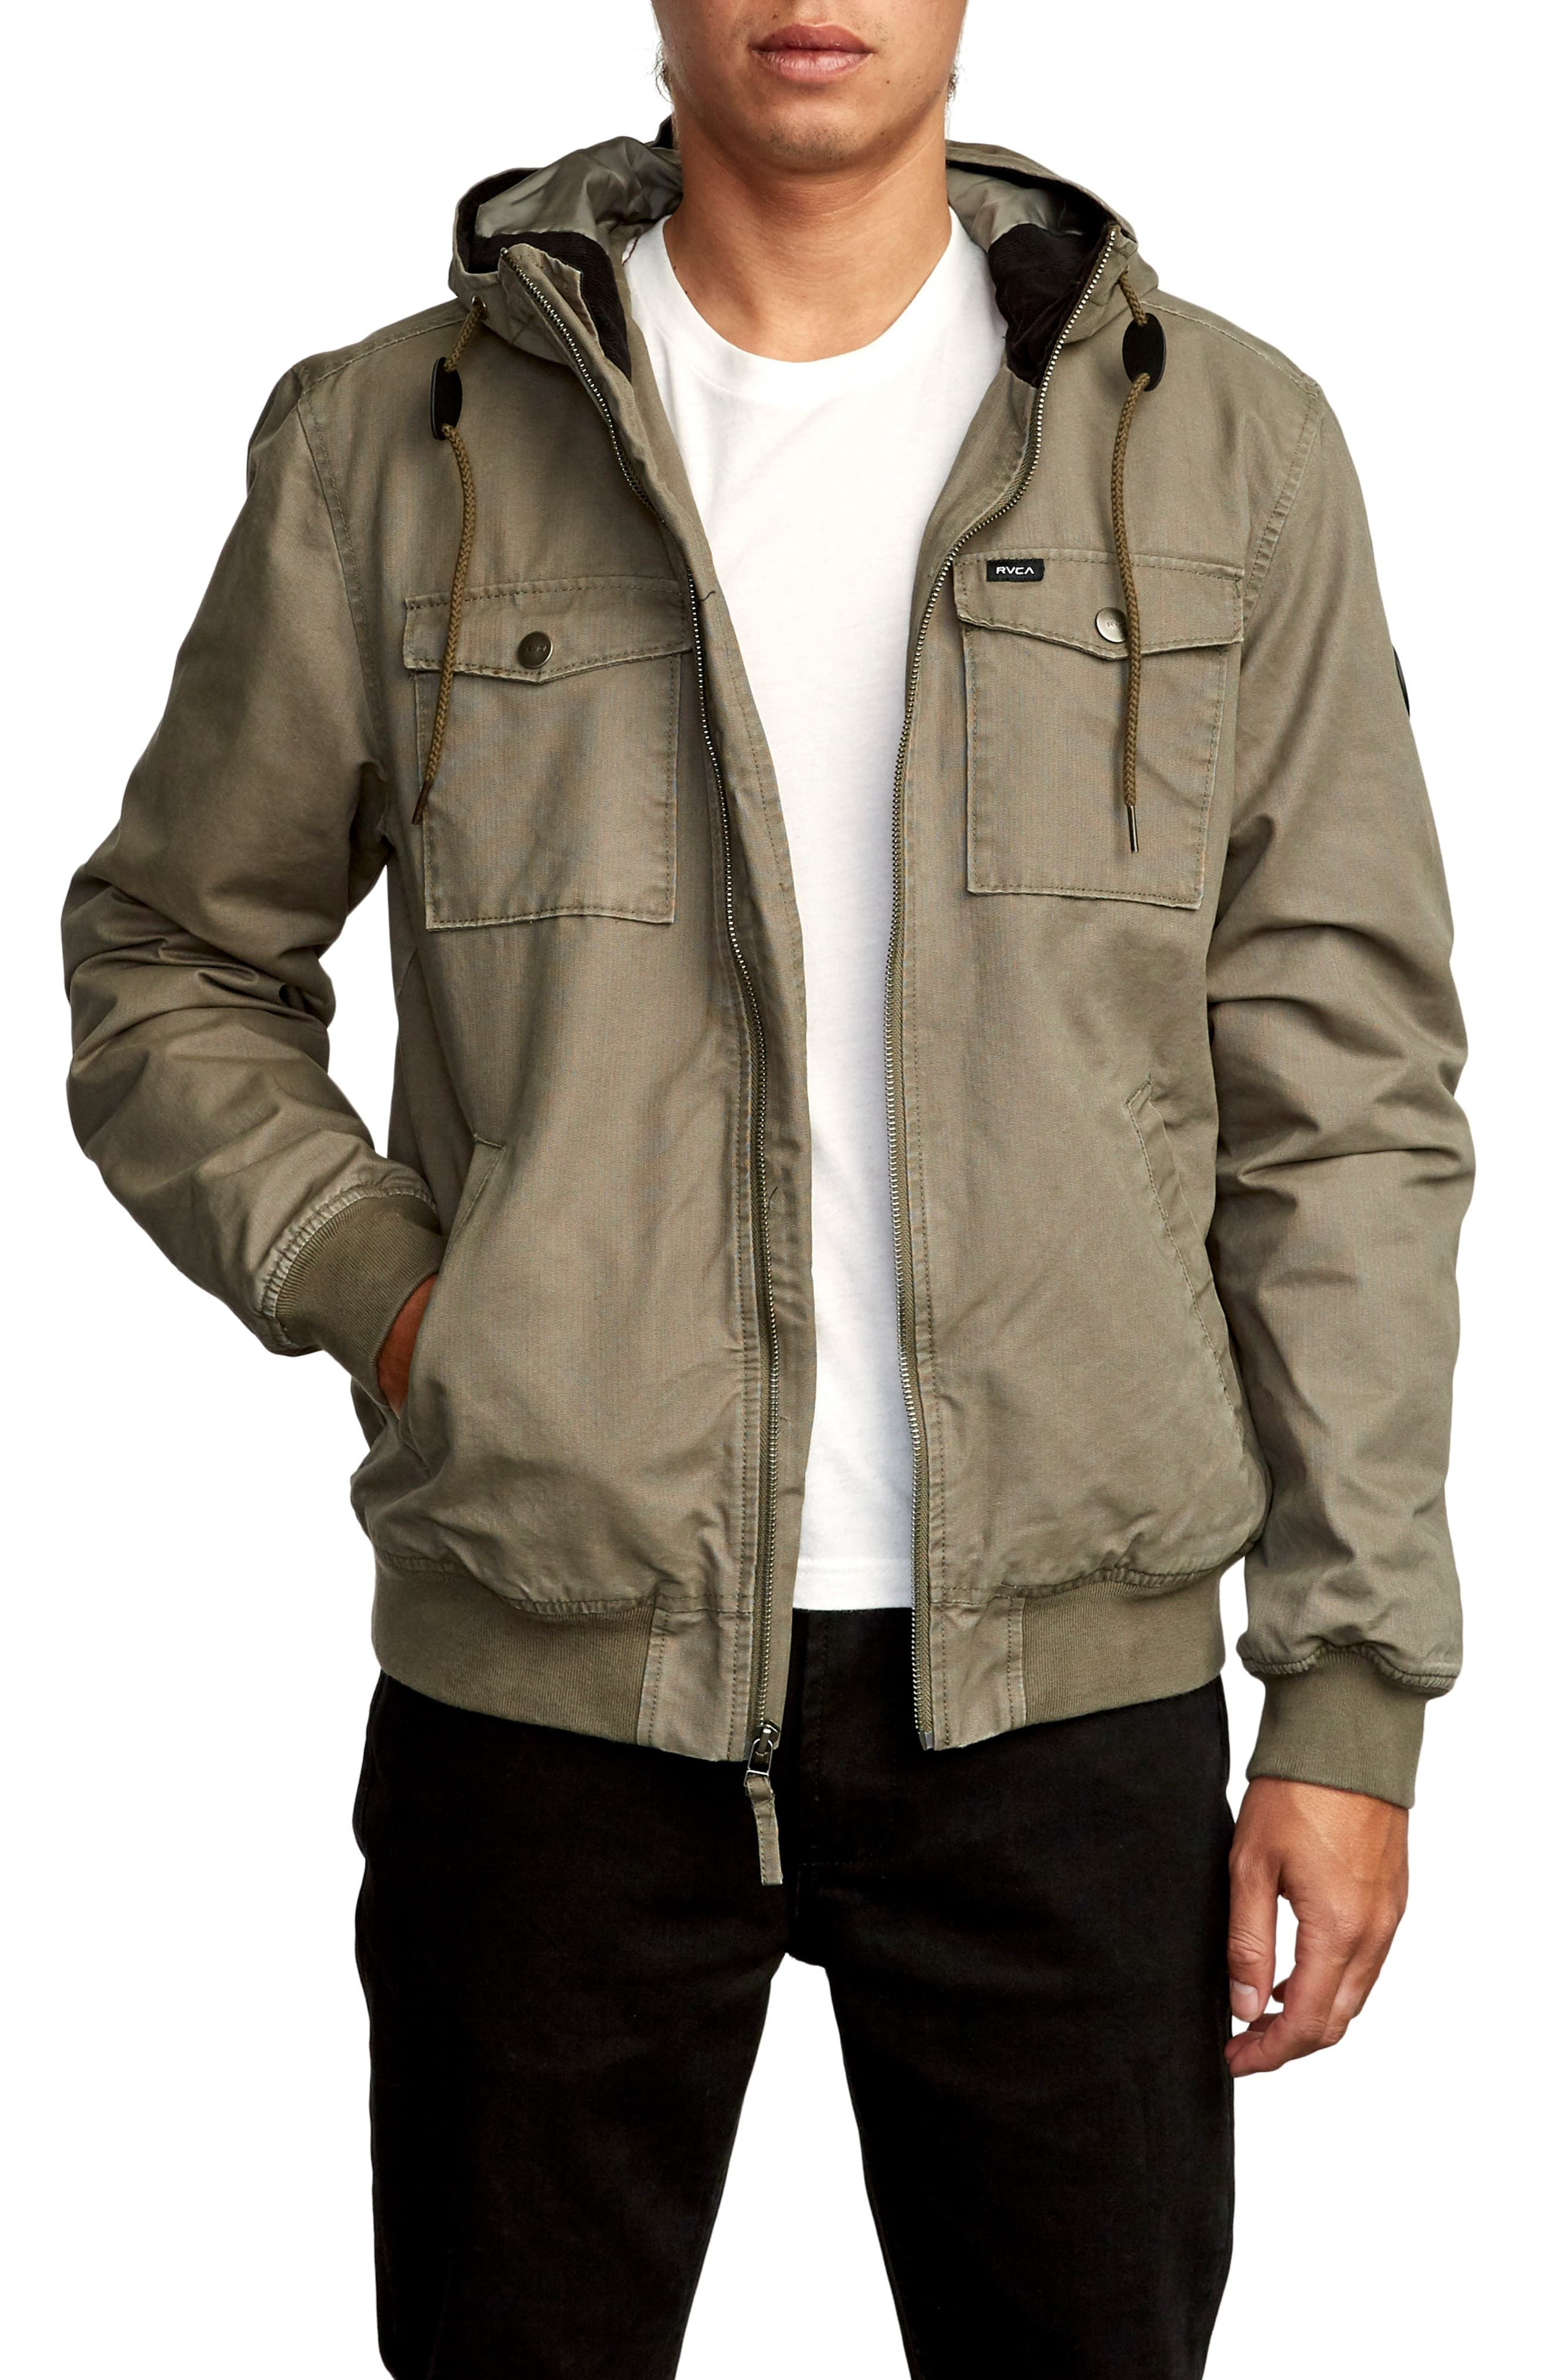 Rvca Hooded Bomber Iii Waterproof Jacket Nordstrom Waterproof Jacket Jackets Cotton Jacket [ 4048 x 2640 Pixel ]